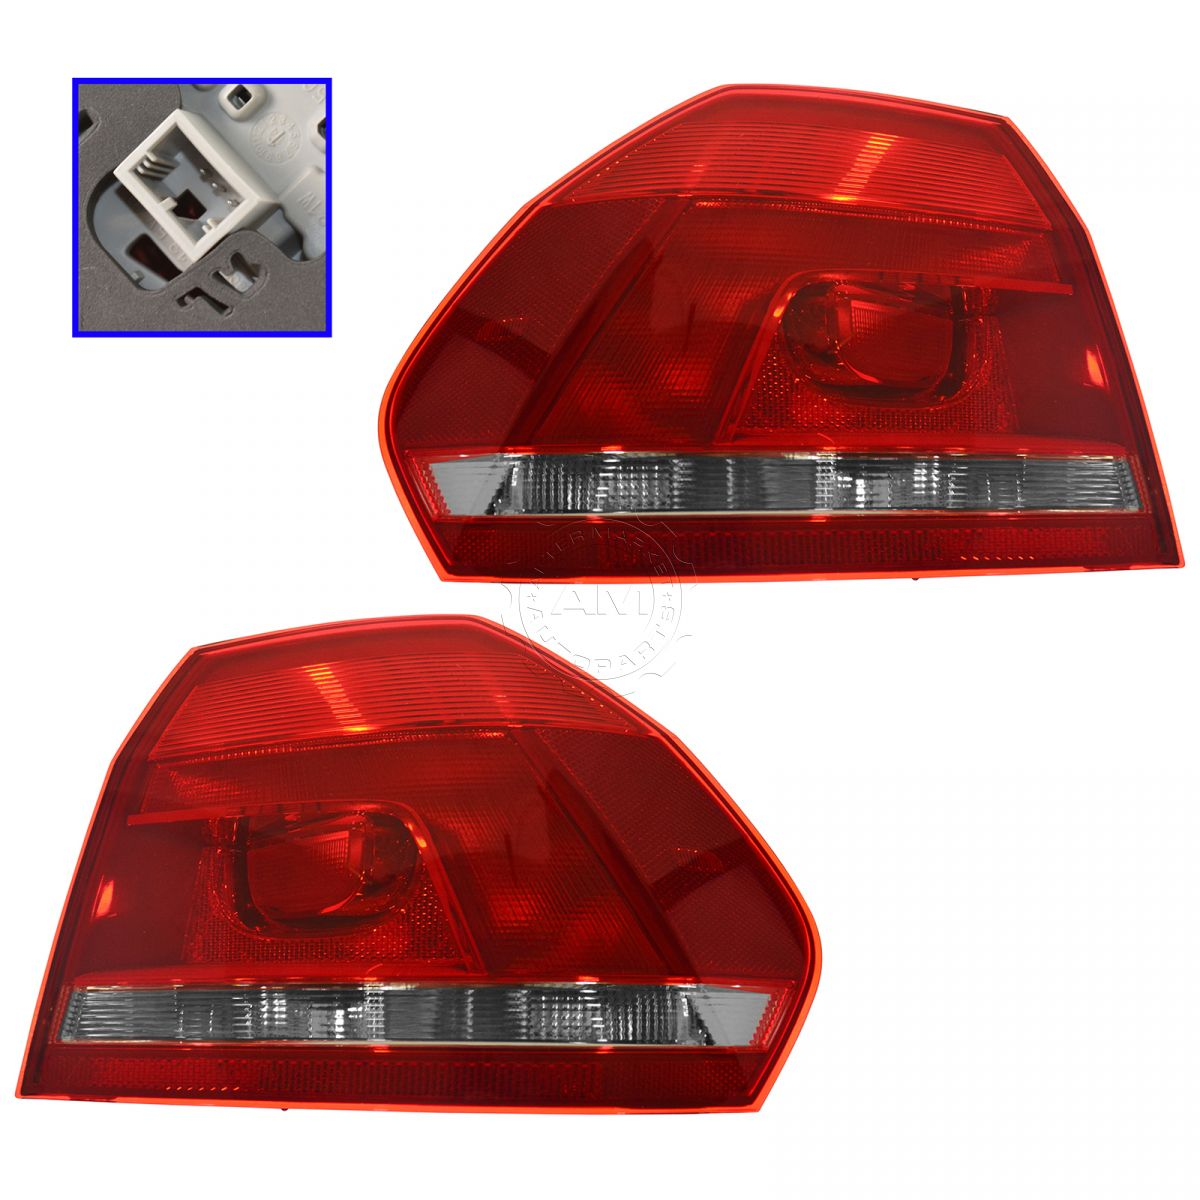 New Set Of 2 Left /& Right Side Fog Lamp Assembly Fits 2012-15 Volkswagen passat